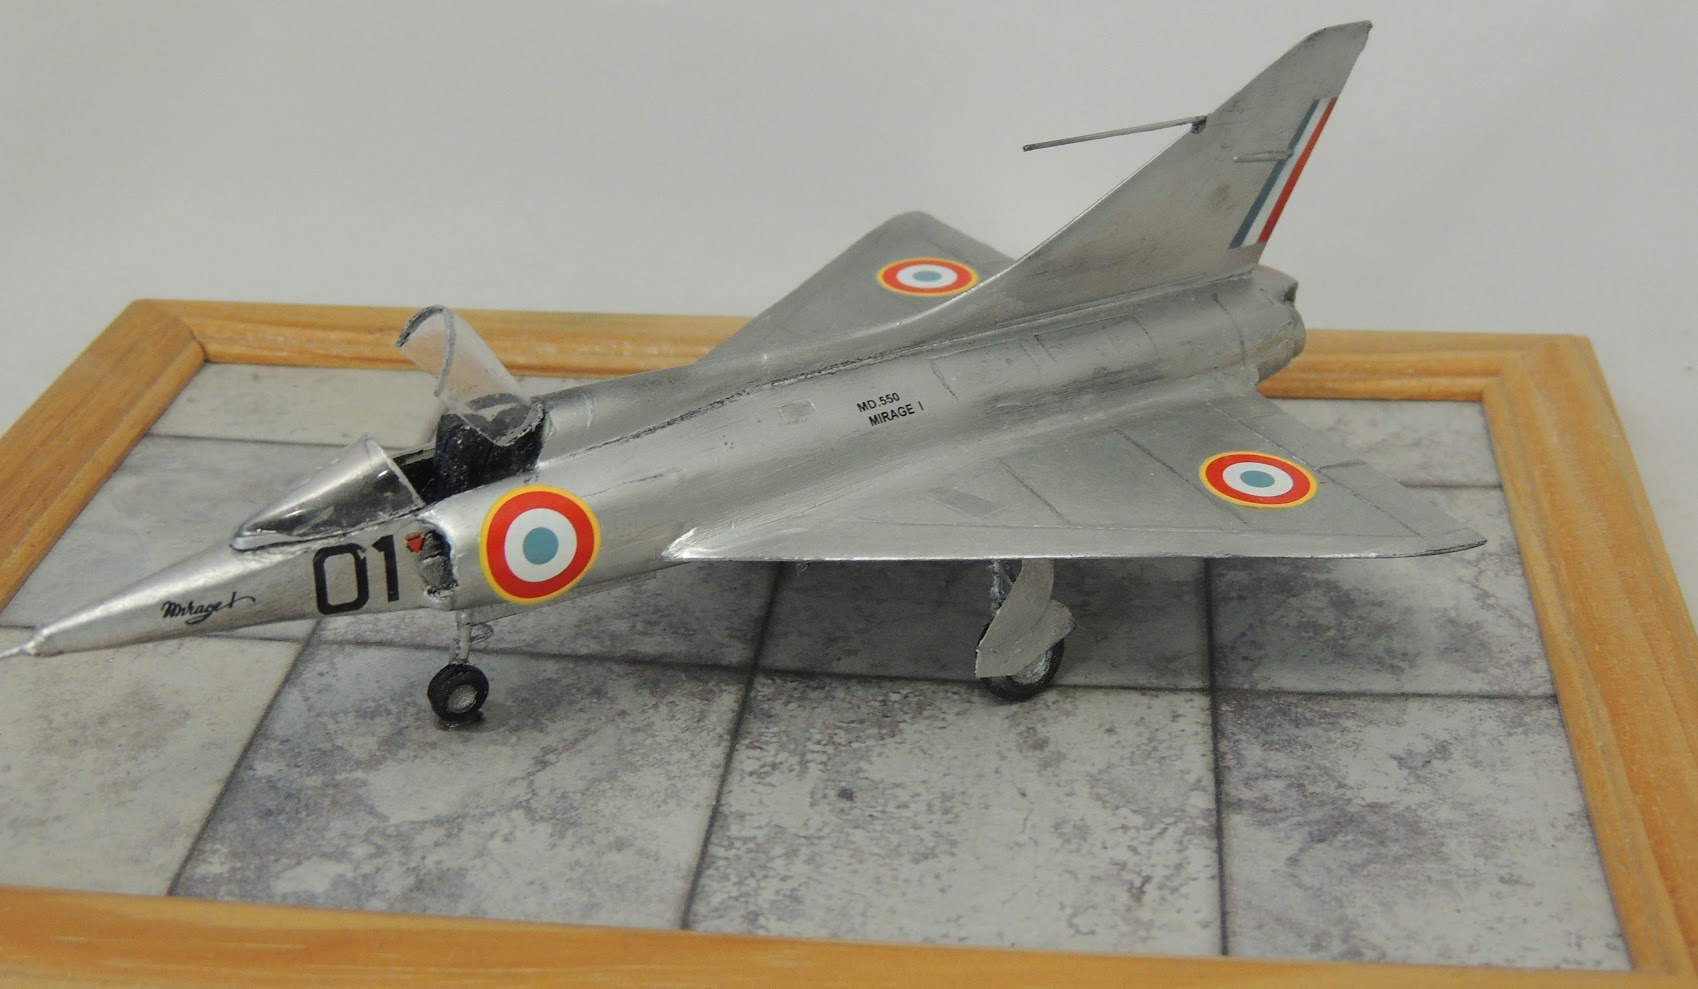 Dassault MD 550 Mirage I - Dujin DTk1WvvrRbGKNDnRc1LrrXsQ1yn0nvYRF7_lu4qjfqvPbnNlqwgQTlf-JO-UVFi9Xe1FssnANoaEAxzXFyYY3K2yICHoSXT0vGOEWUqttZchpp6BYptD9NQoW4QUOQz38D1KobrUq0es-E_mRC8TRrhWcsEReoTgzM0qo0AxSIZ_OUYxefDtqmCLkPoyQZ3wzaCluAeuzO5VwRg5mKTegbXSsjJ0brCL3kFVPZWaY6FU8DylO1Sh9wwPmXWVoJ5sqb5K53cqolmFKhSKzzTr7jdzrWMcH9NDZ9hzjzxwUc05LYrYBngIdu9tHKnJQcCd05dECExhgLba9sX96I1nHR2256j4WzJnYcTipr-0-Etwt8CD9wkbYlA5bLQiXcR0oies_TVcxP596aG7qJqqrKnZbKYSU9bPkA7NOcwRLX-7cuThpRIUEtYVqw8NPi6W_dX9At5CnBP7GdczlW7C4LNEZYwQNV_gXWA_3QblPyYksikQ94qBVpwbiOfJD54gnFcidQUM6odeD_FCEyU-o6vR9RO3JZw-x1RzfkKGd7Qu2hxnET9EjIlifD5MvtOJ6dwDPHAupREDRuqNEfiA92qcq5Cq0cAsx1JwtEs=w1698-h989-no